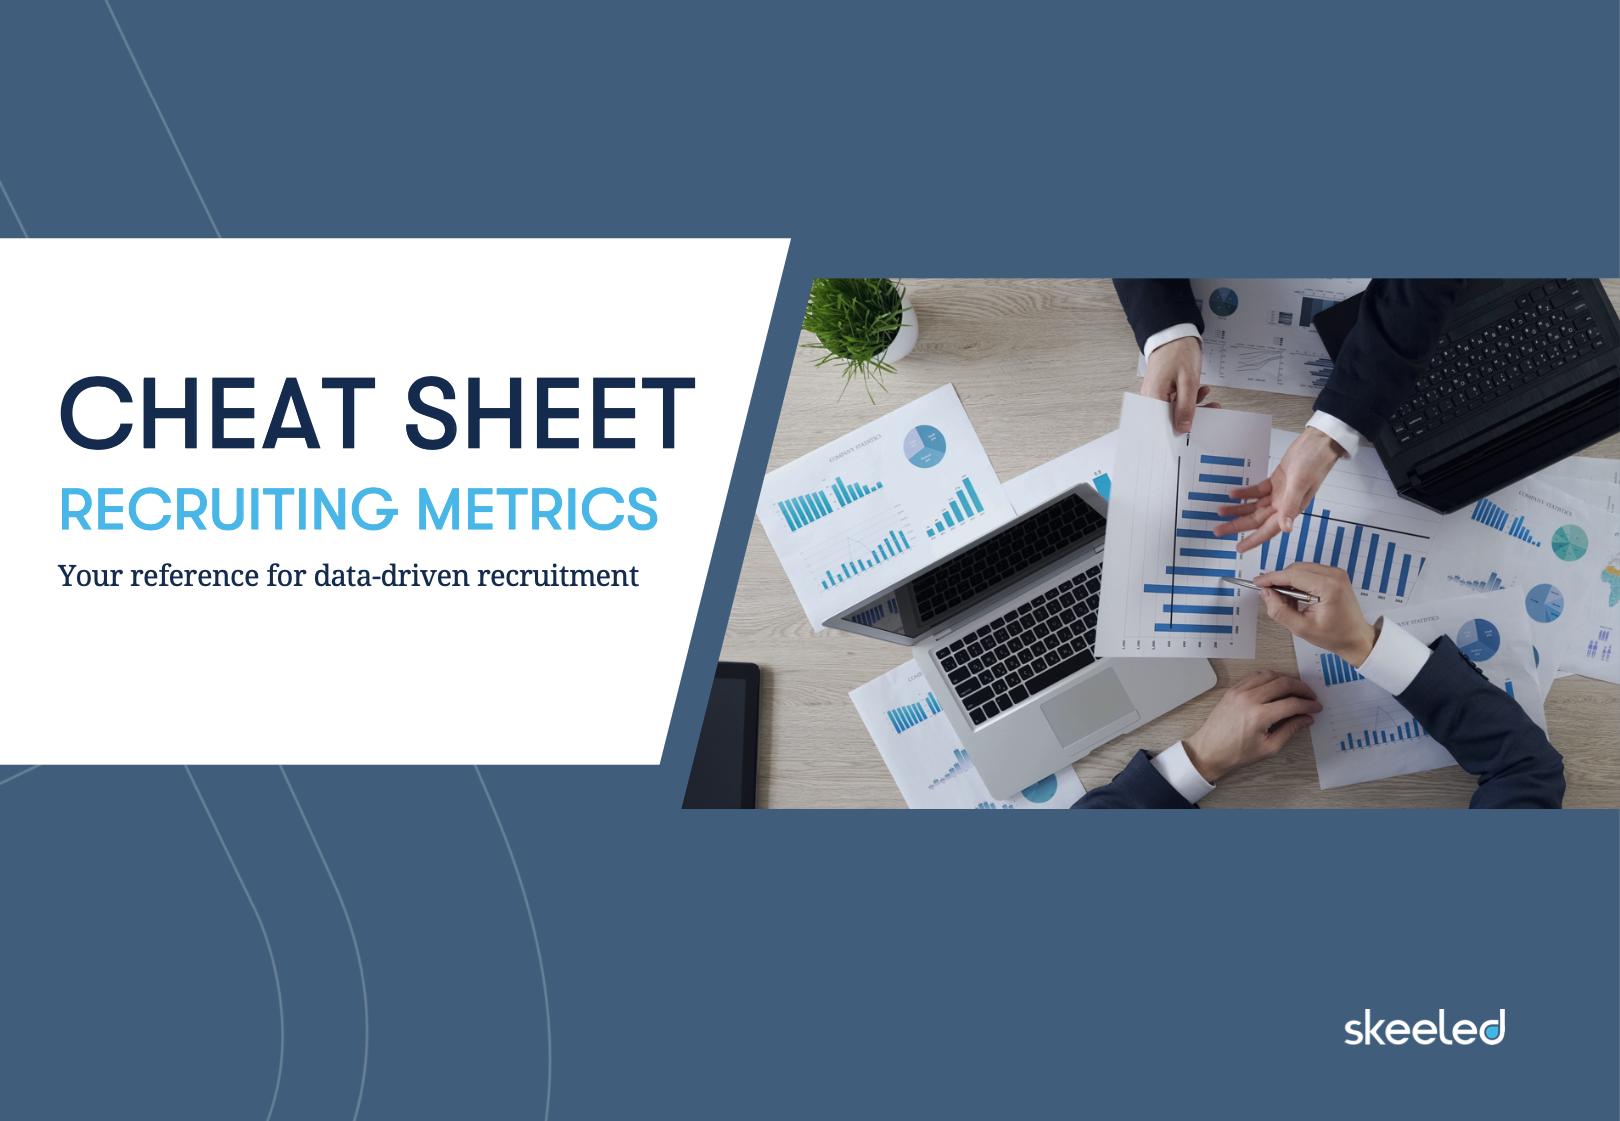 recruiting-metrics-cheat-sheet-cover